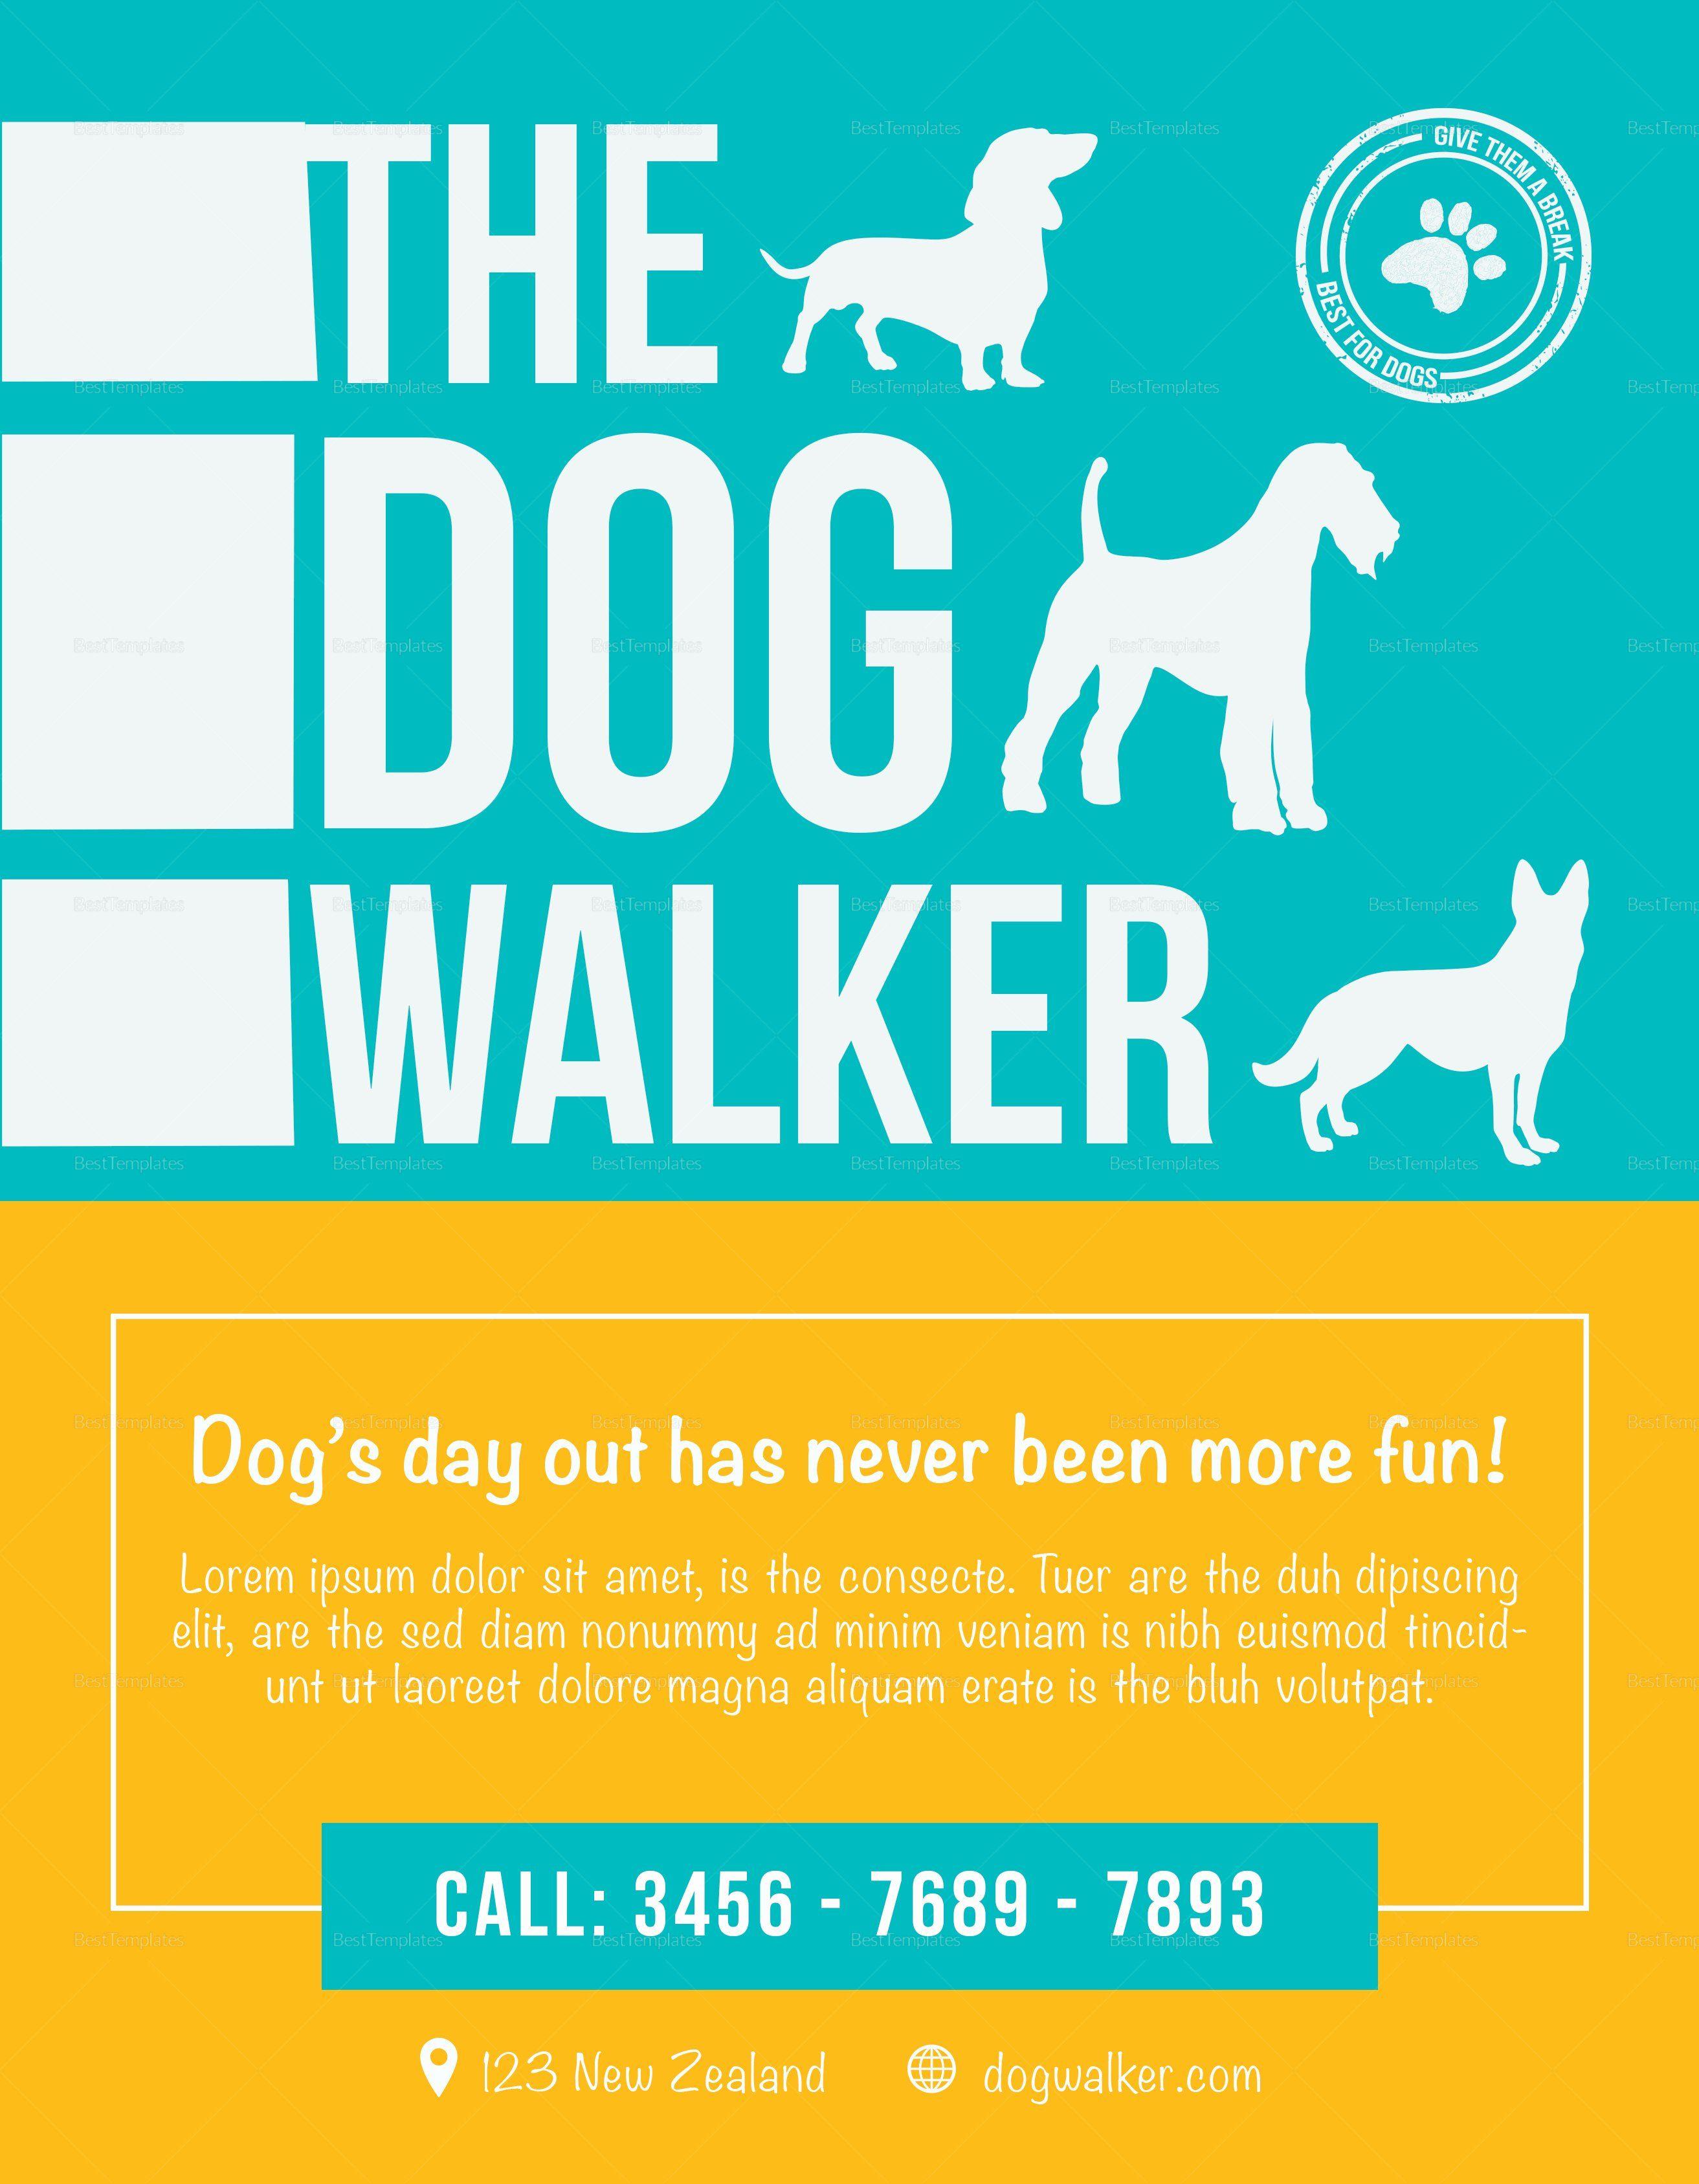 Dog Walking Flyer Template Beautiful Dog Walker Flyer Design Template In Psd Word Publisher Dog Walking Flyer Dog Walker Flyer Flyer Template